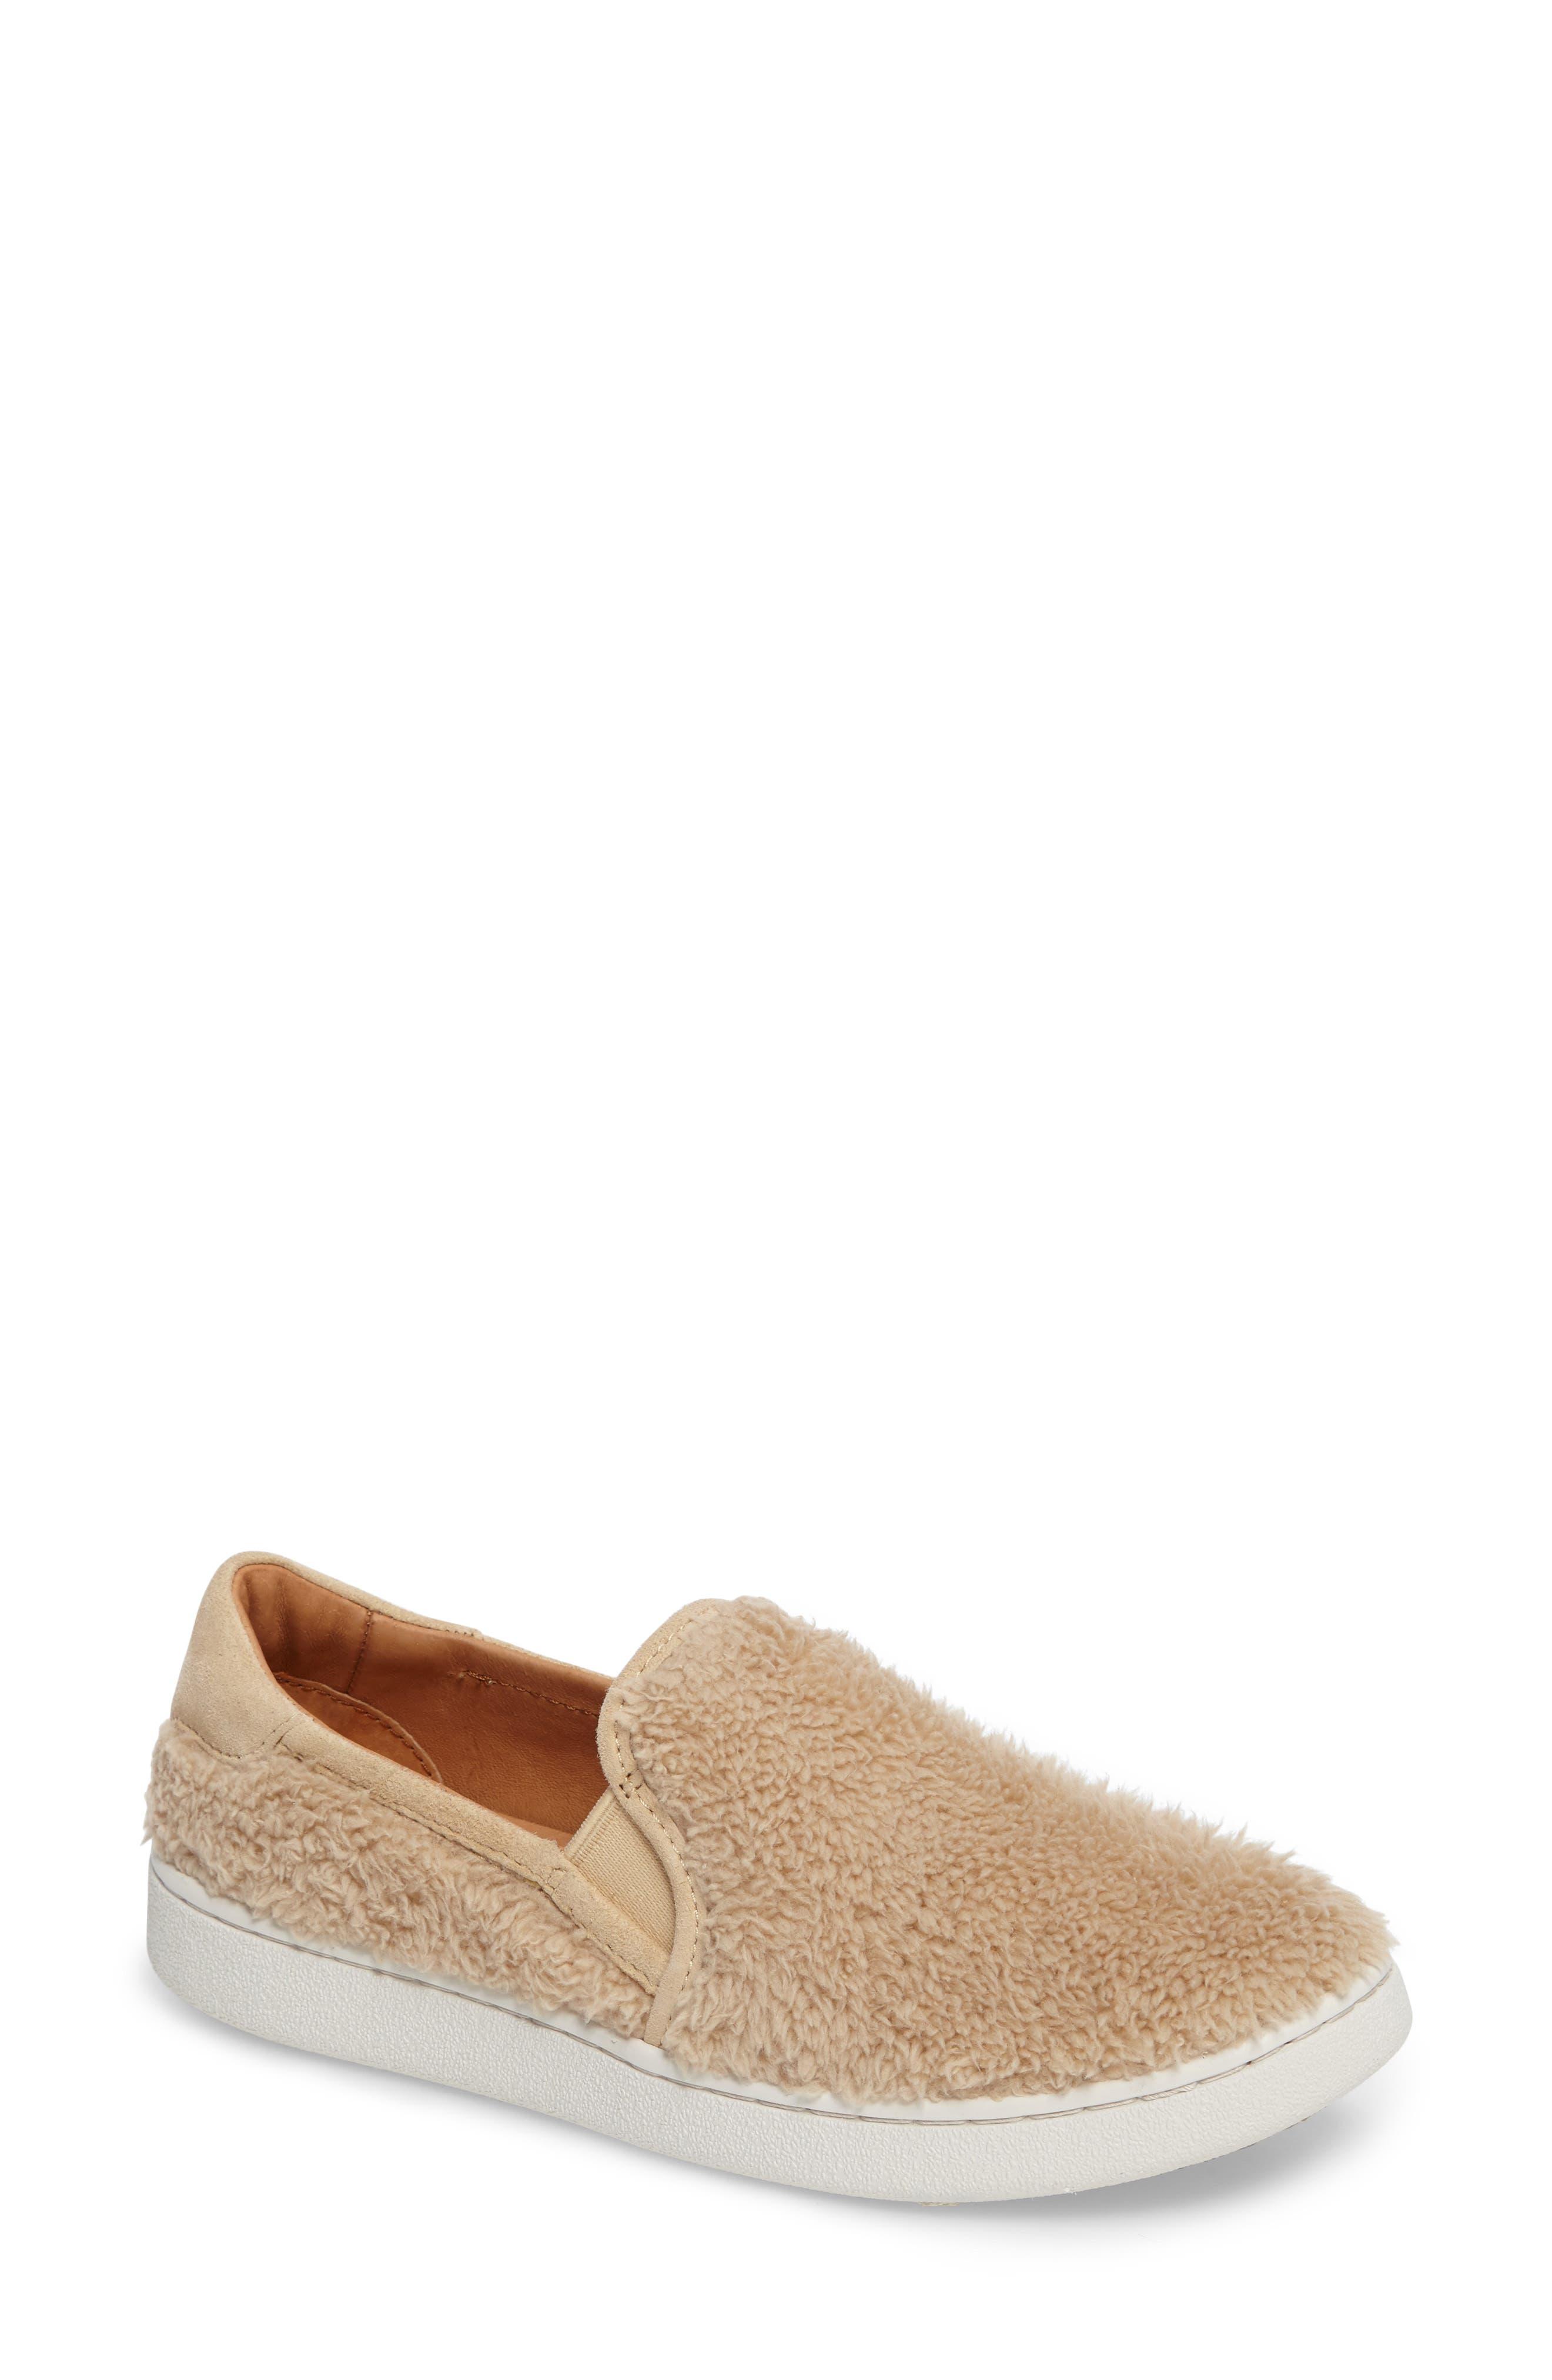 Main Image - UGG® Ricci Plush Slip-On Sneaker (Women)